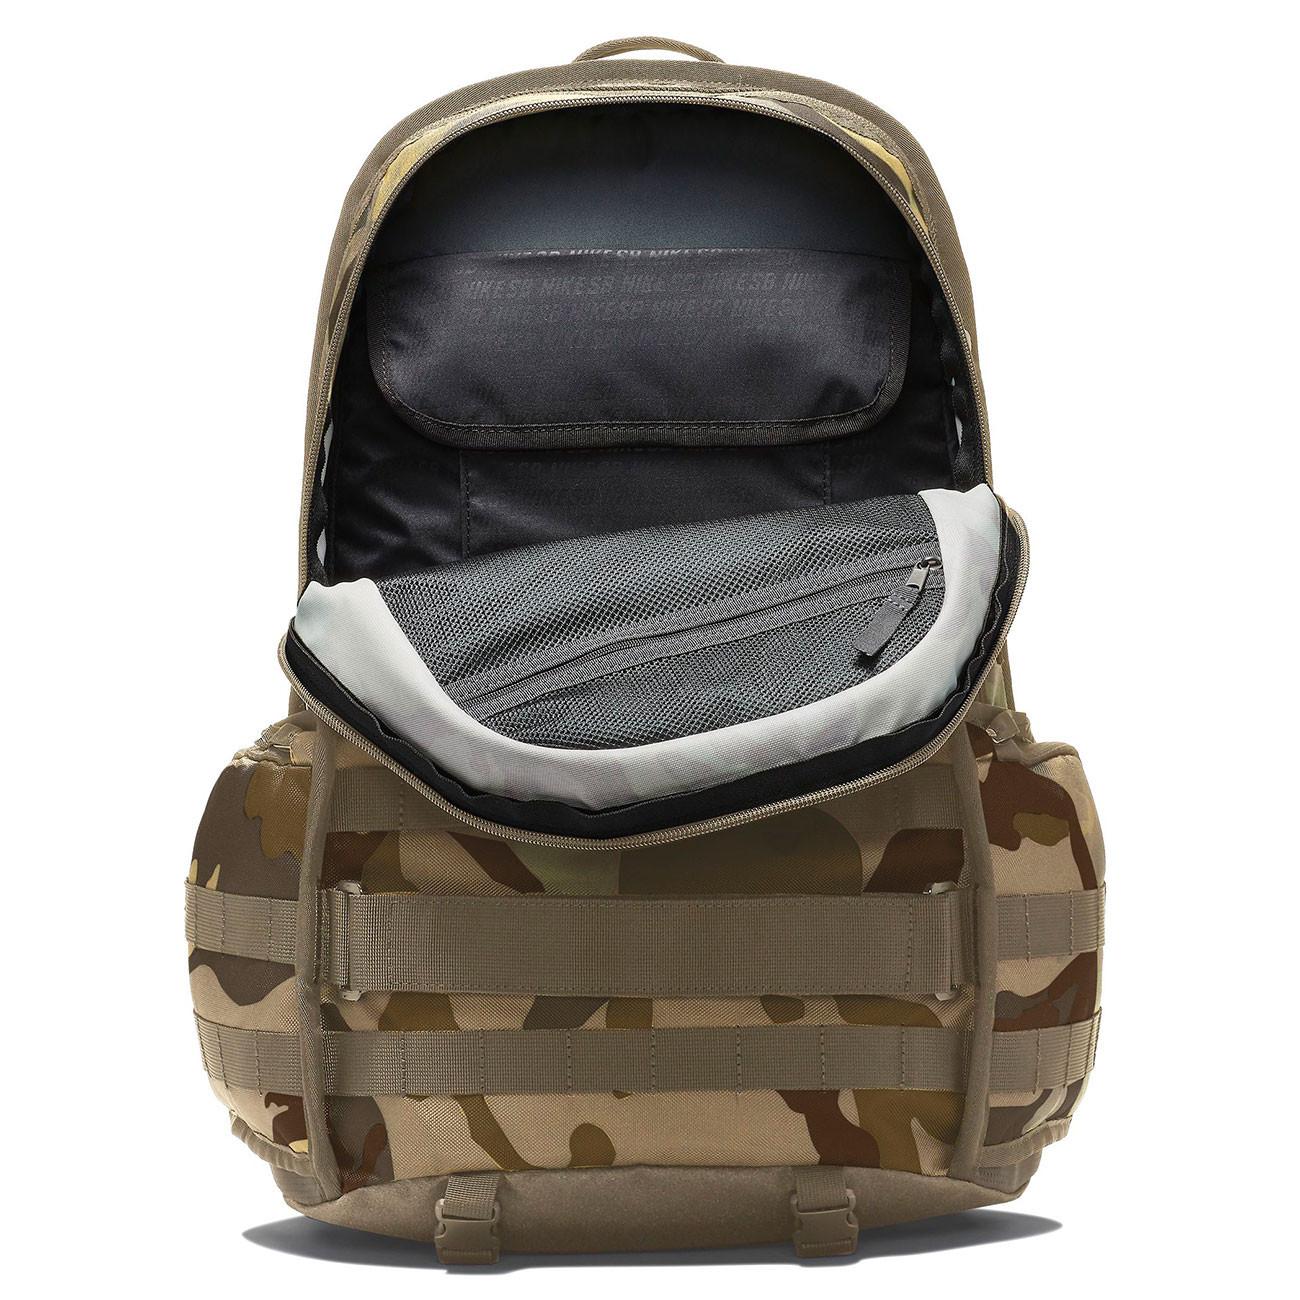 Nota Confinar Entretener  Backpack Nike SB RPM desert camo/desert camo   Snowboard Zezula